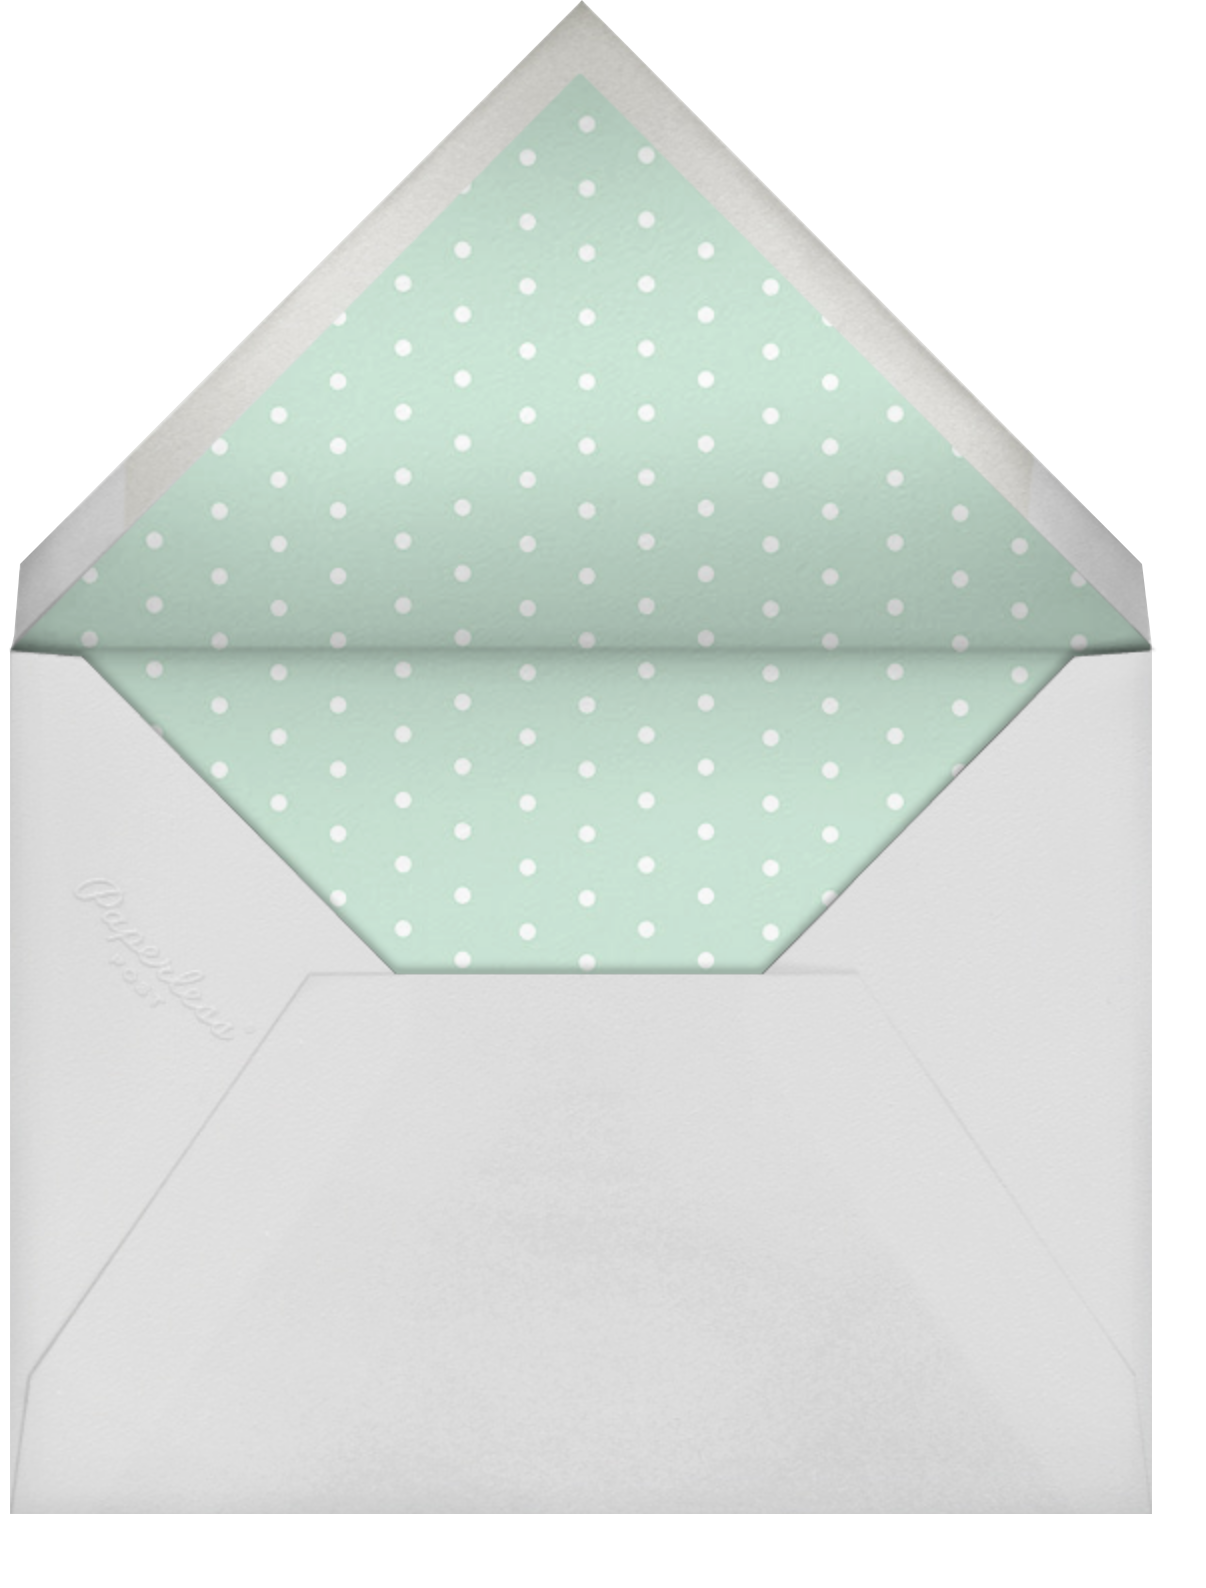 The Baby Basics - Rifle Paper Co. - Envelope